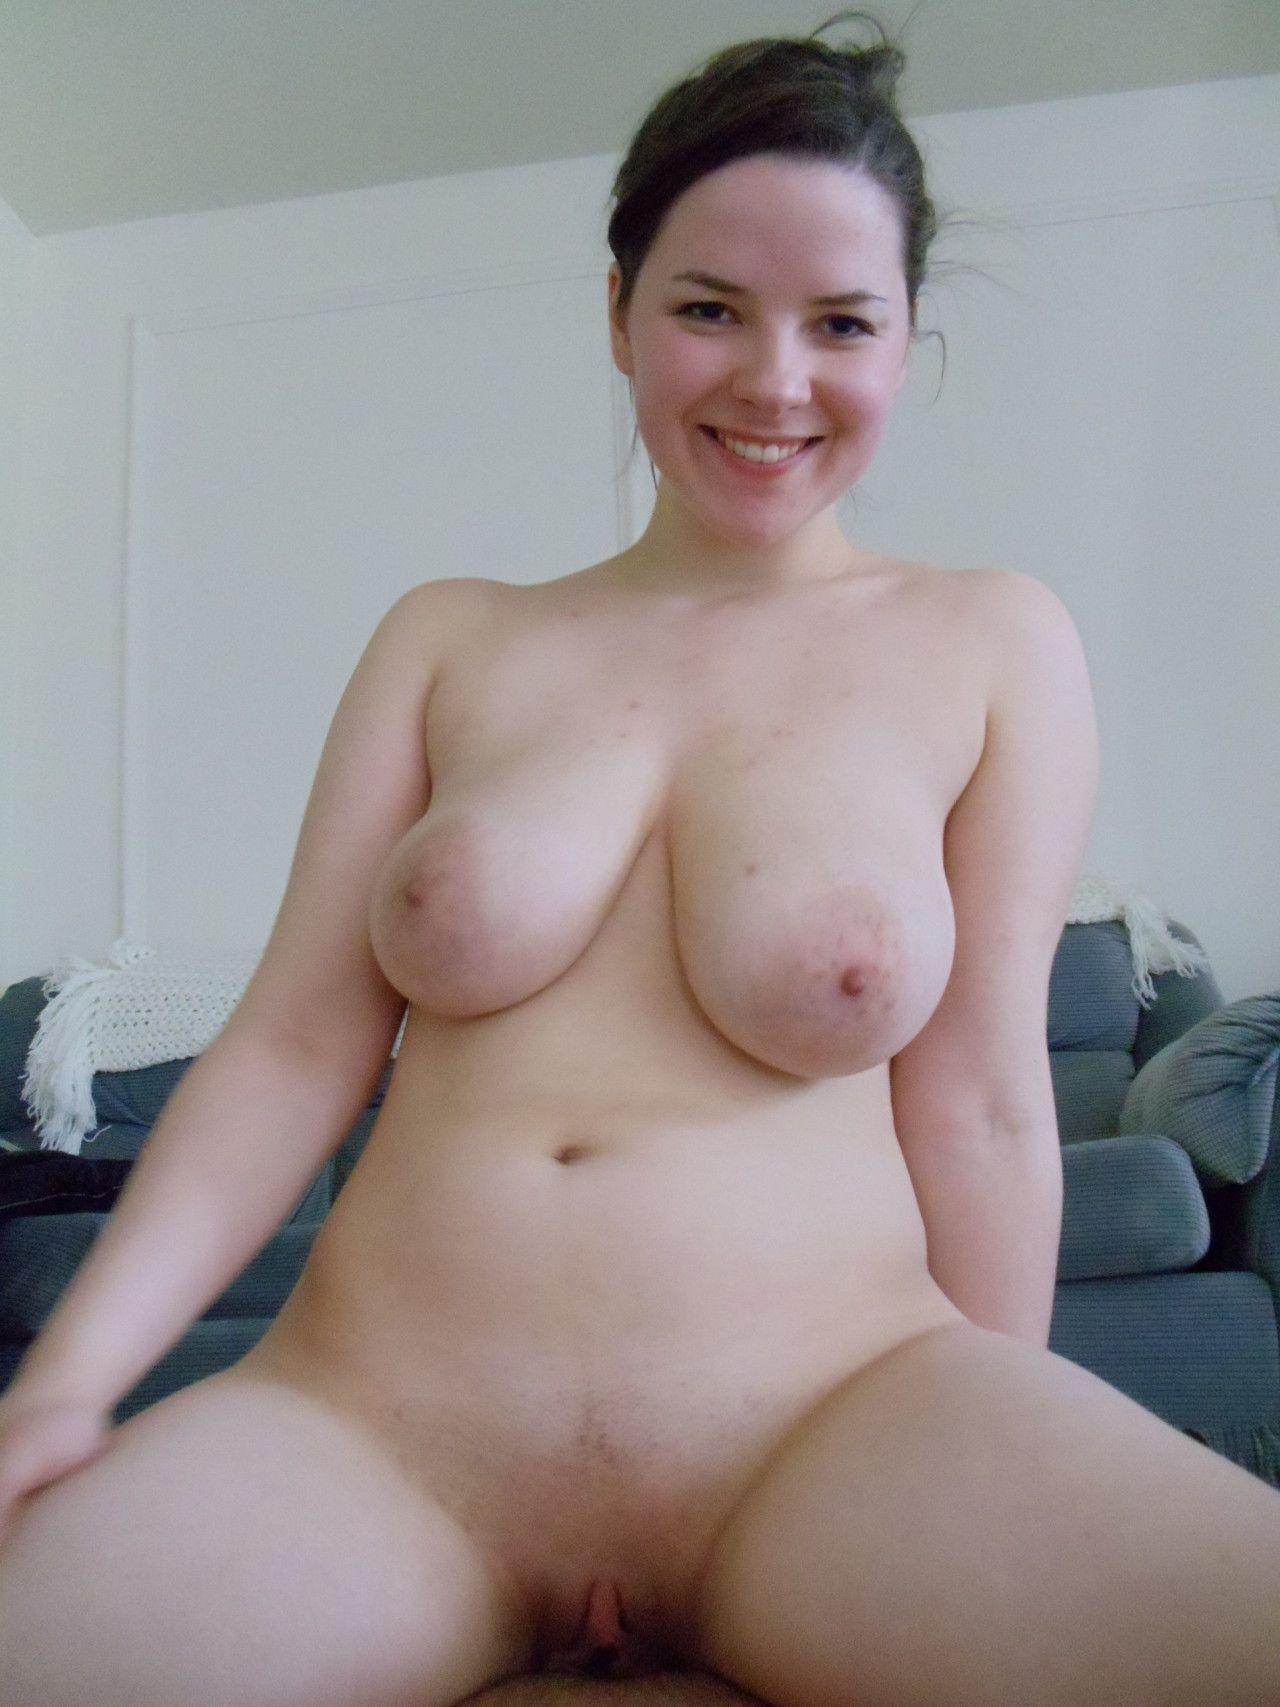 best of Her teta titi tata boobi Boob humongous